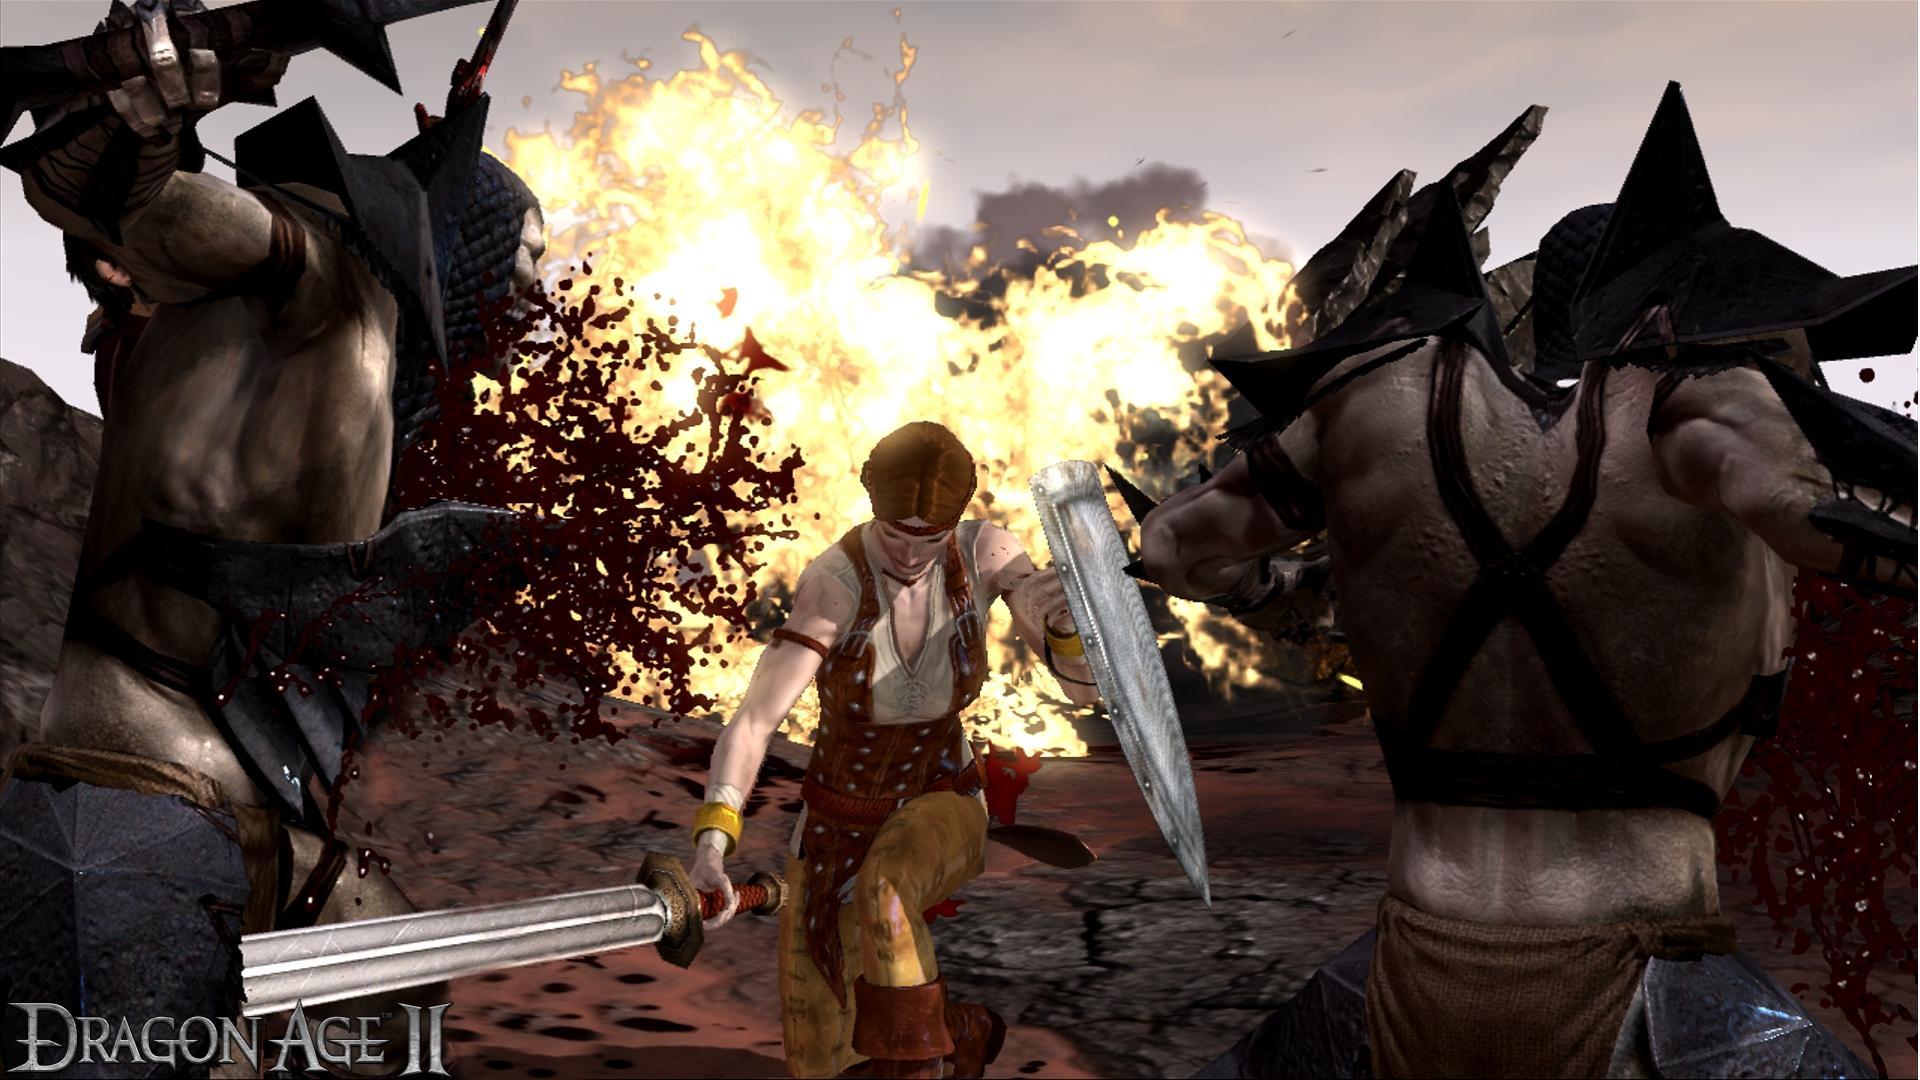 Dragon Age II – Ferelden opět potřebuje hrdinu 13112